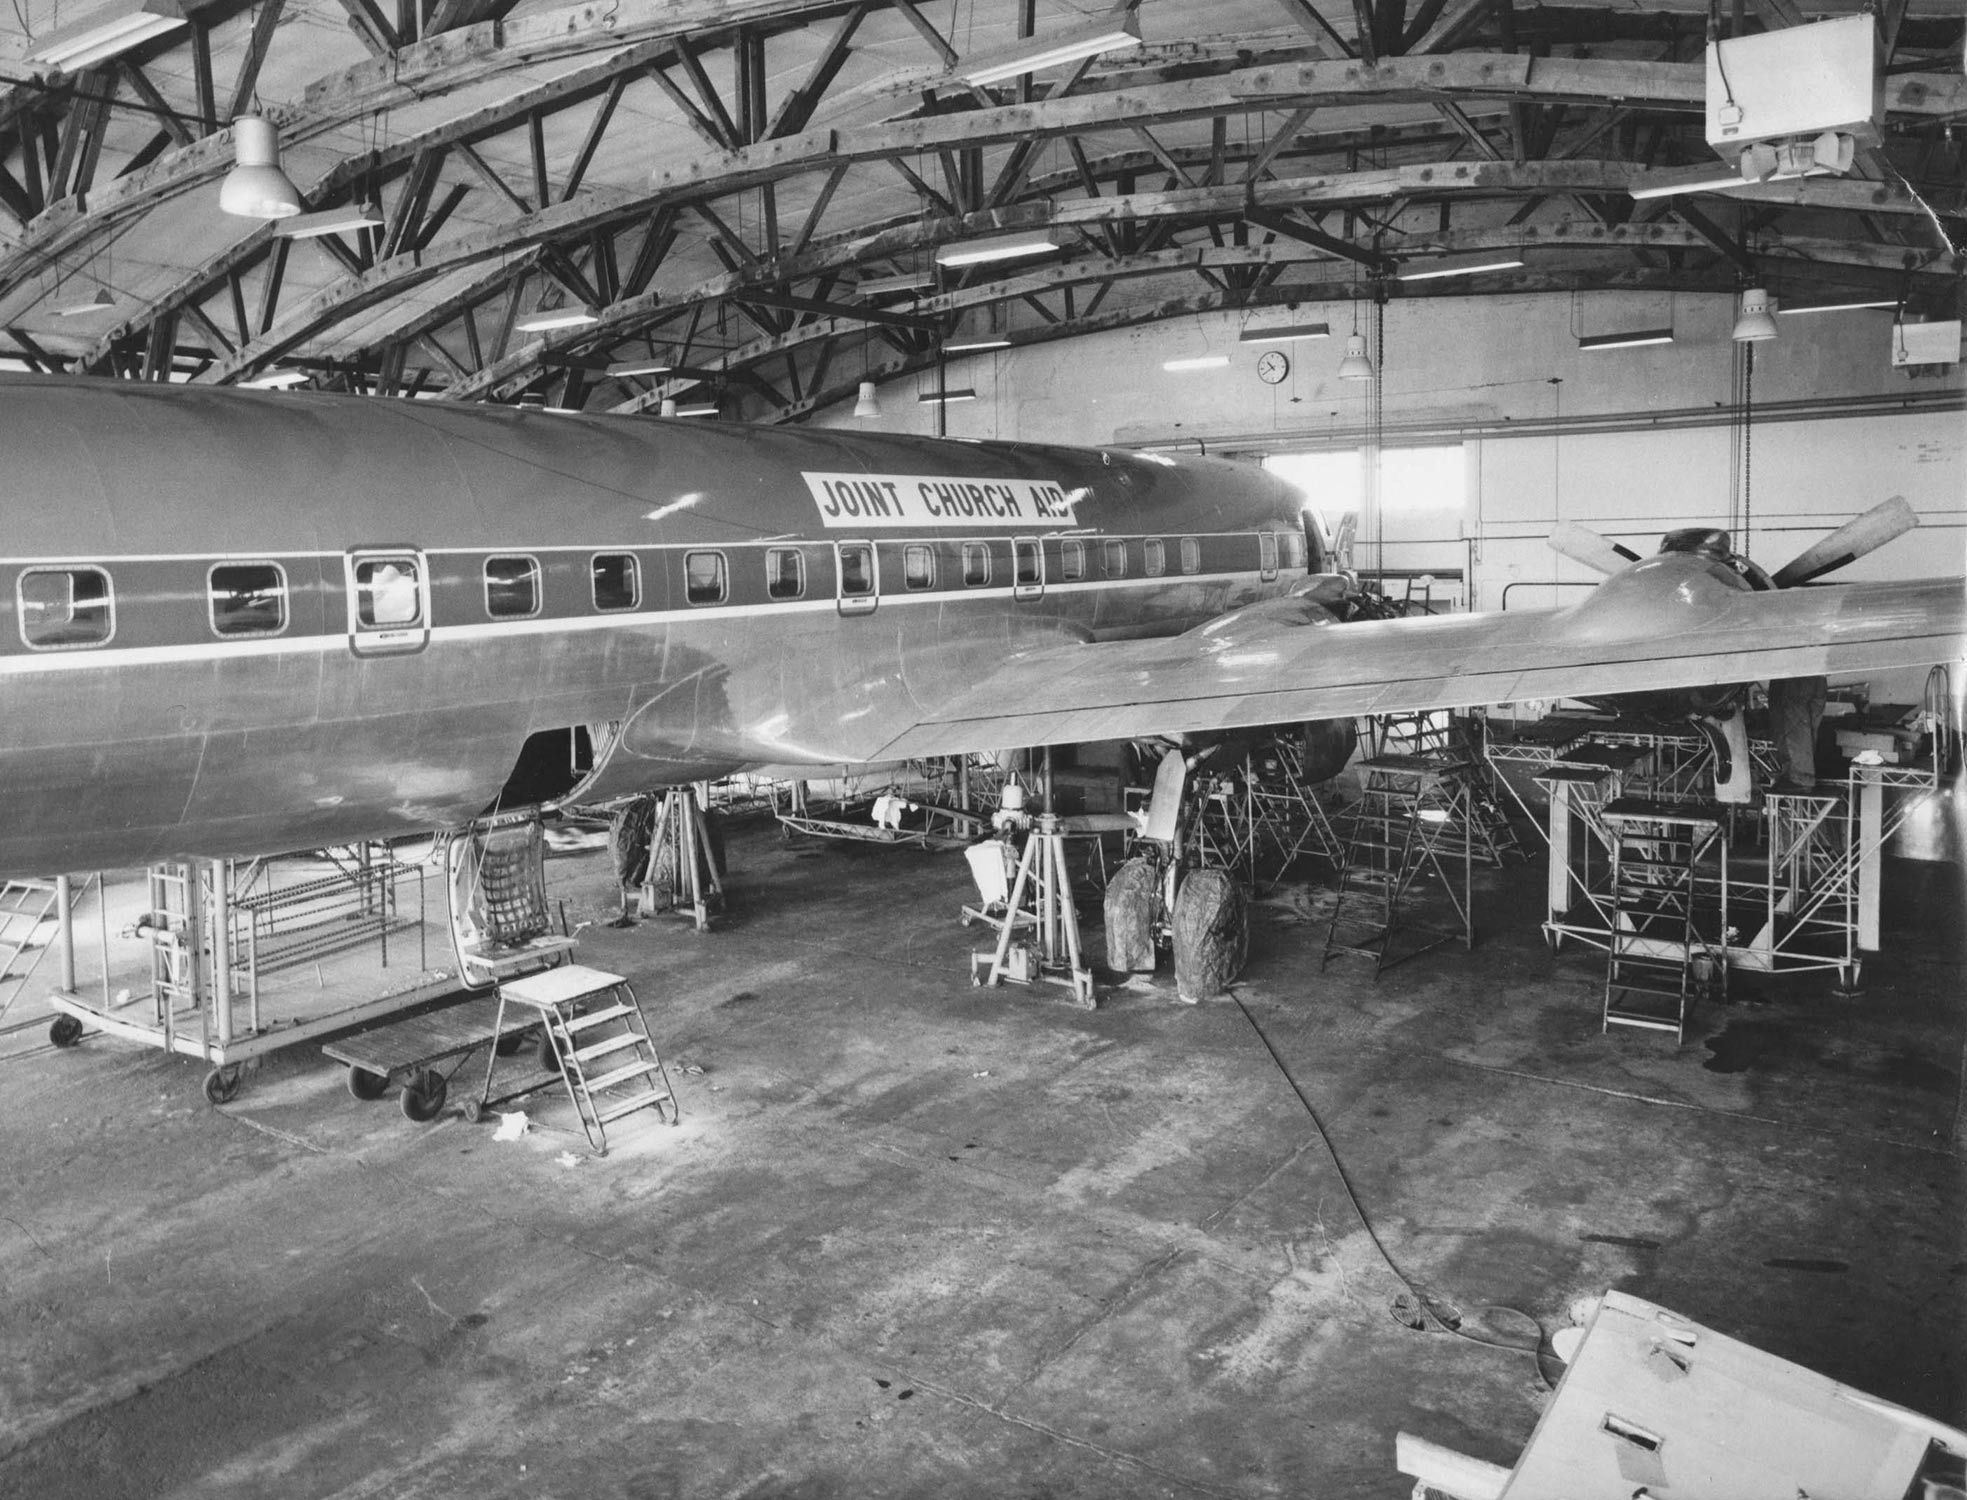 JCA Fly under Biafrakrigen